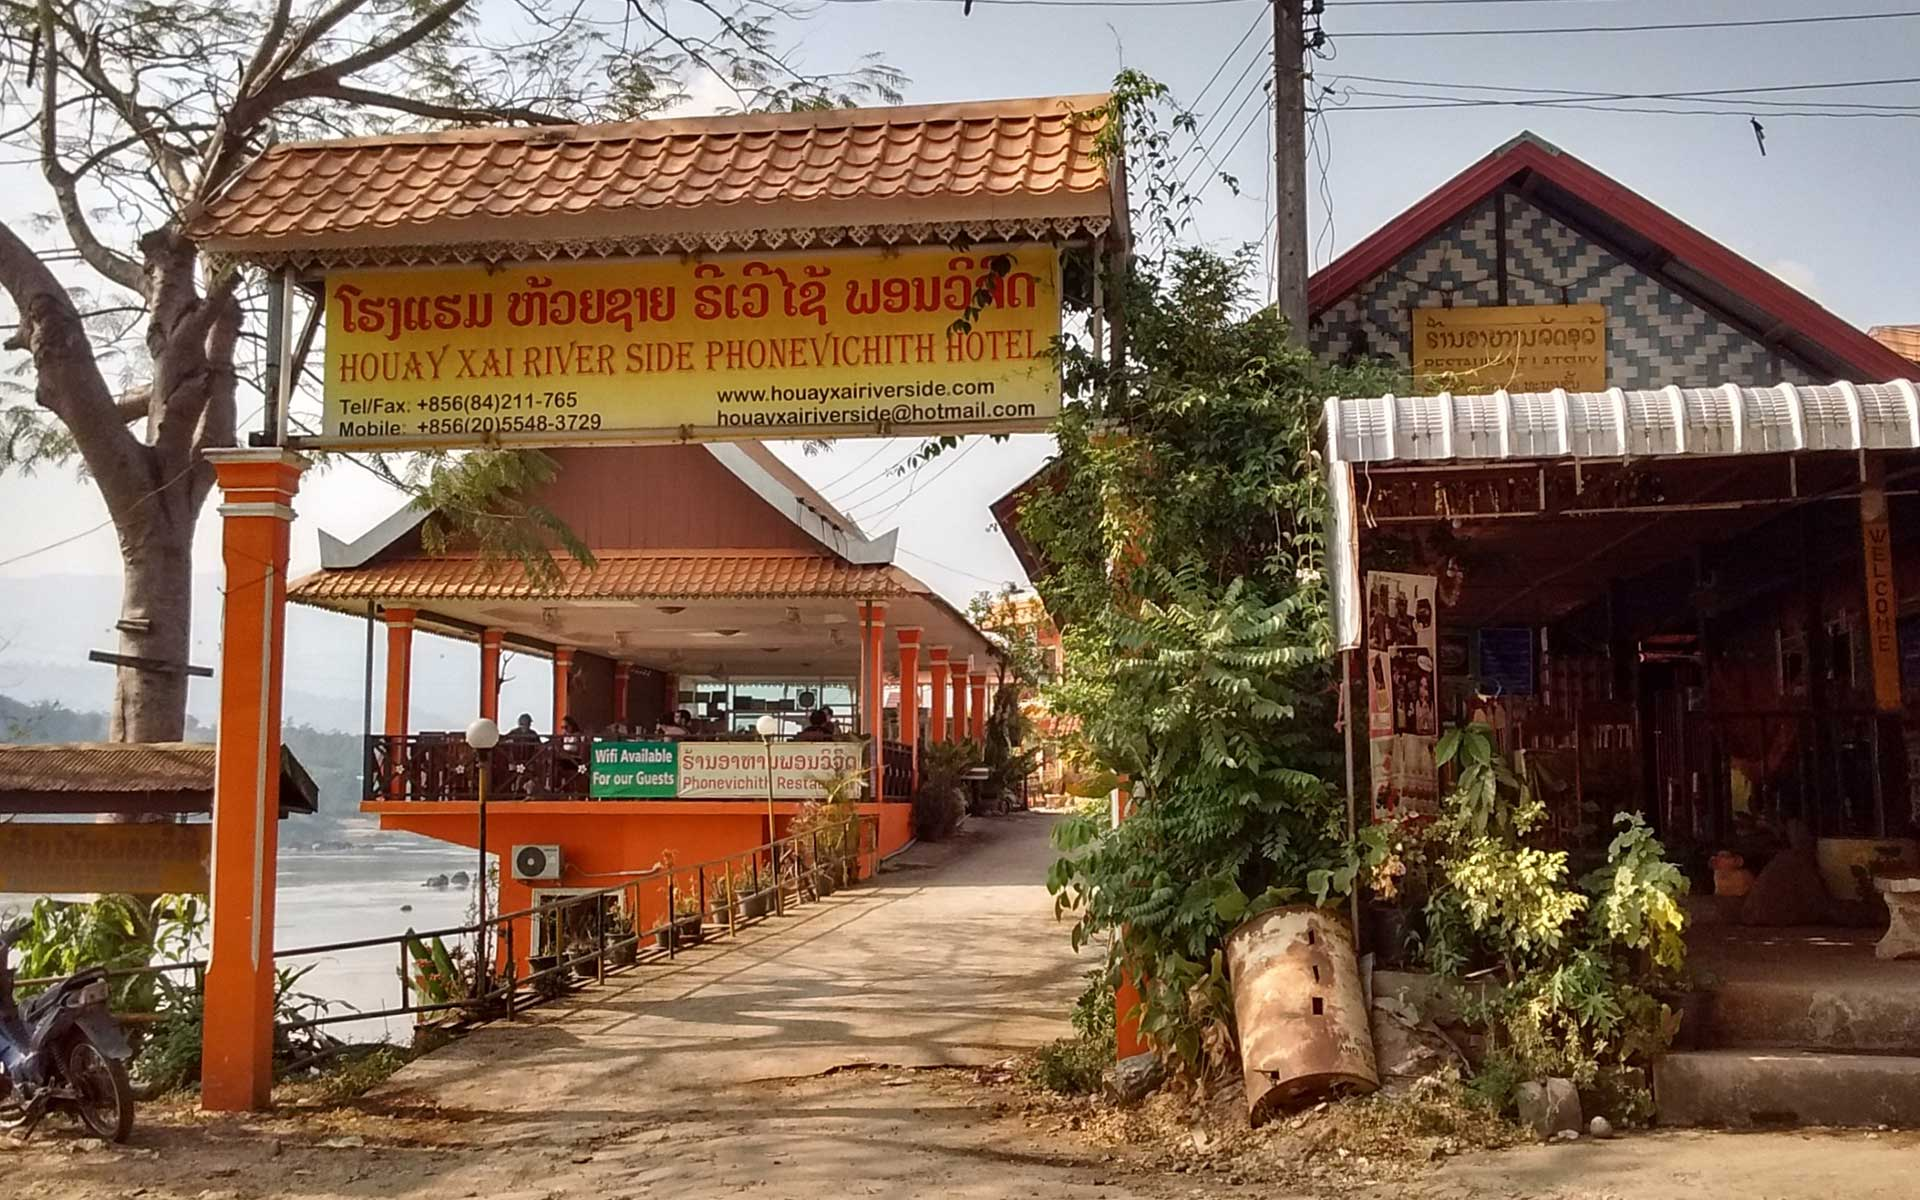 Houay Xai Riverside Hotel